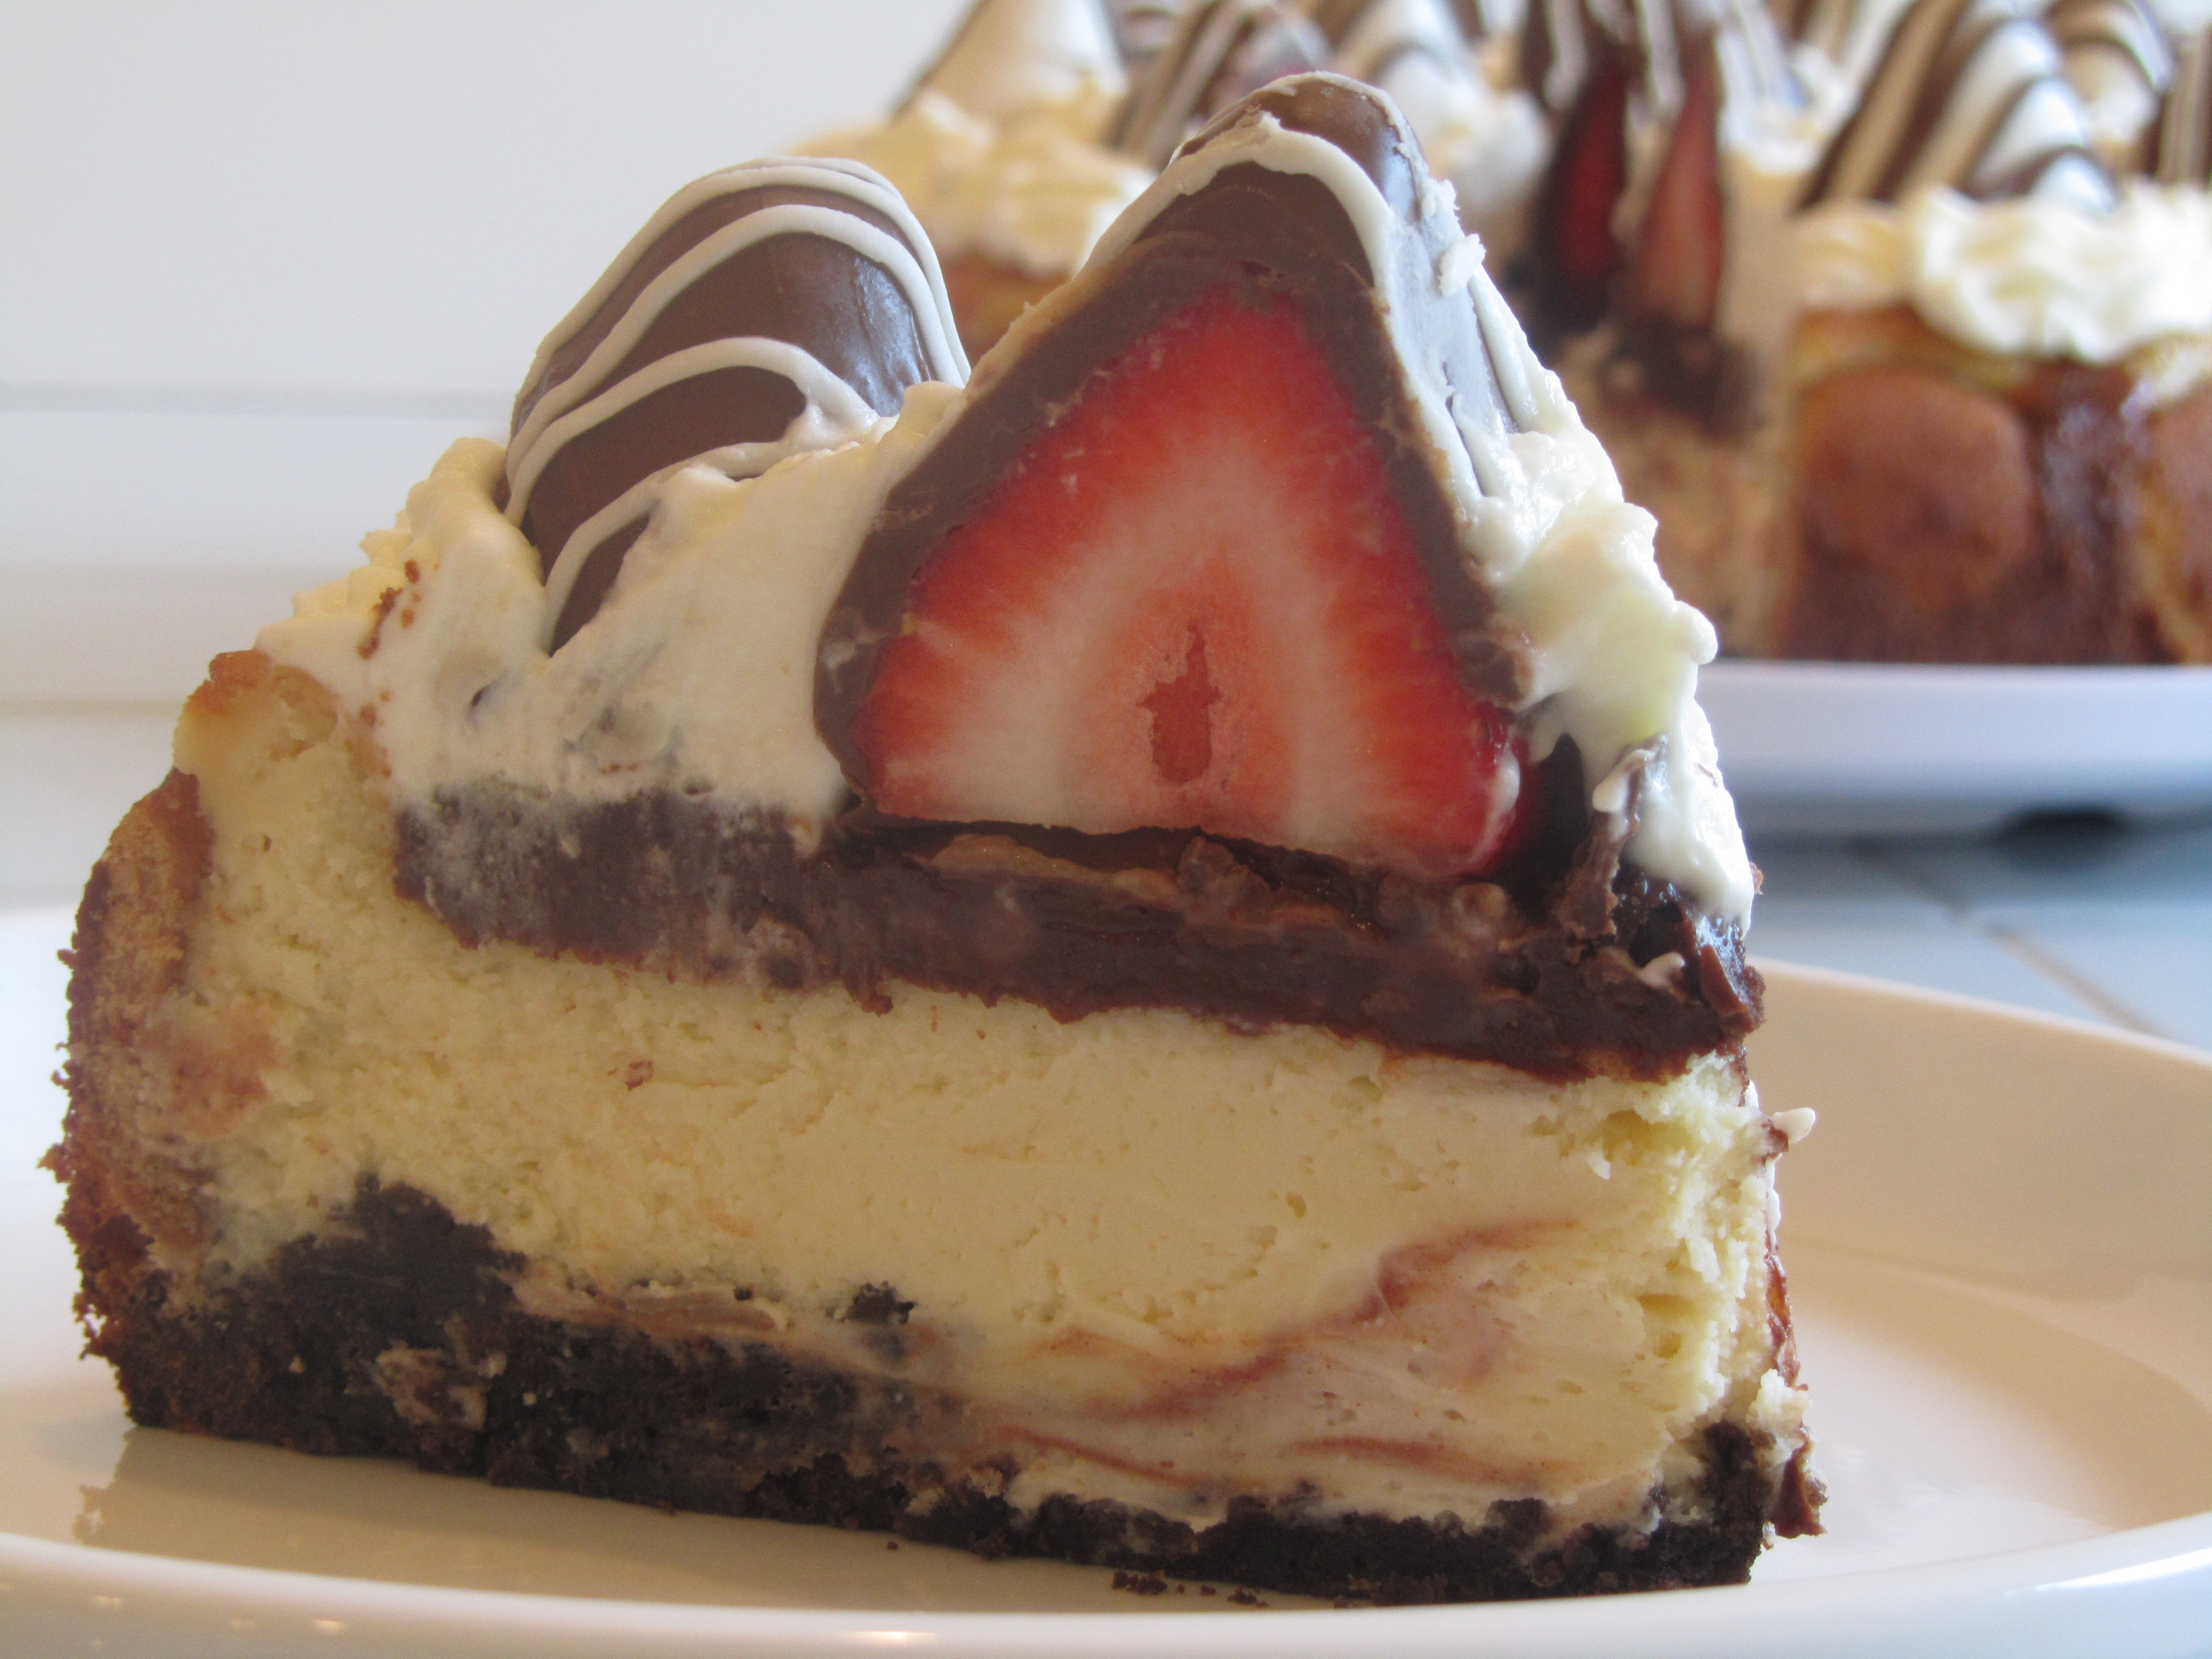 white chocolate cheesecake | eASYbAKED